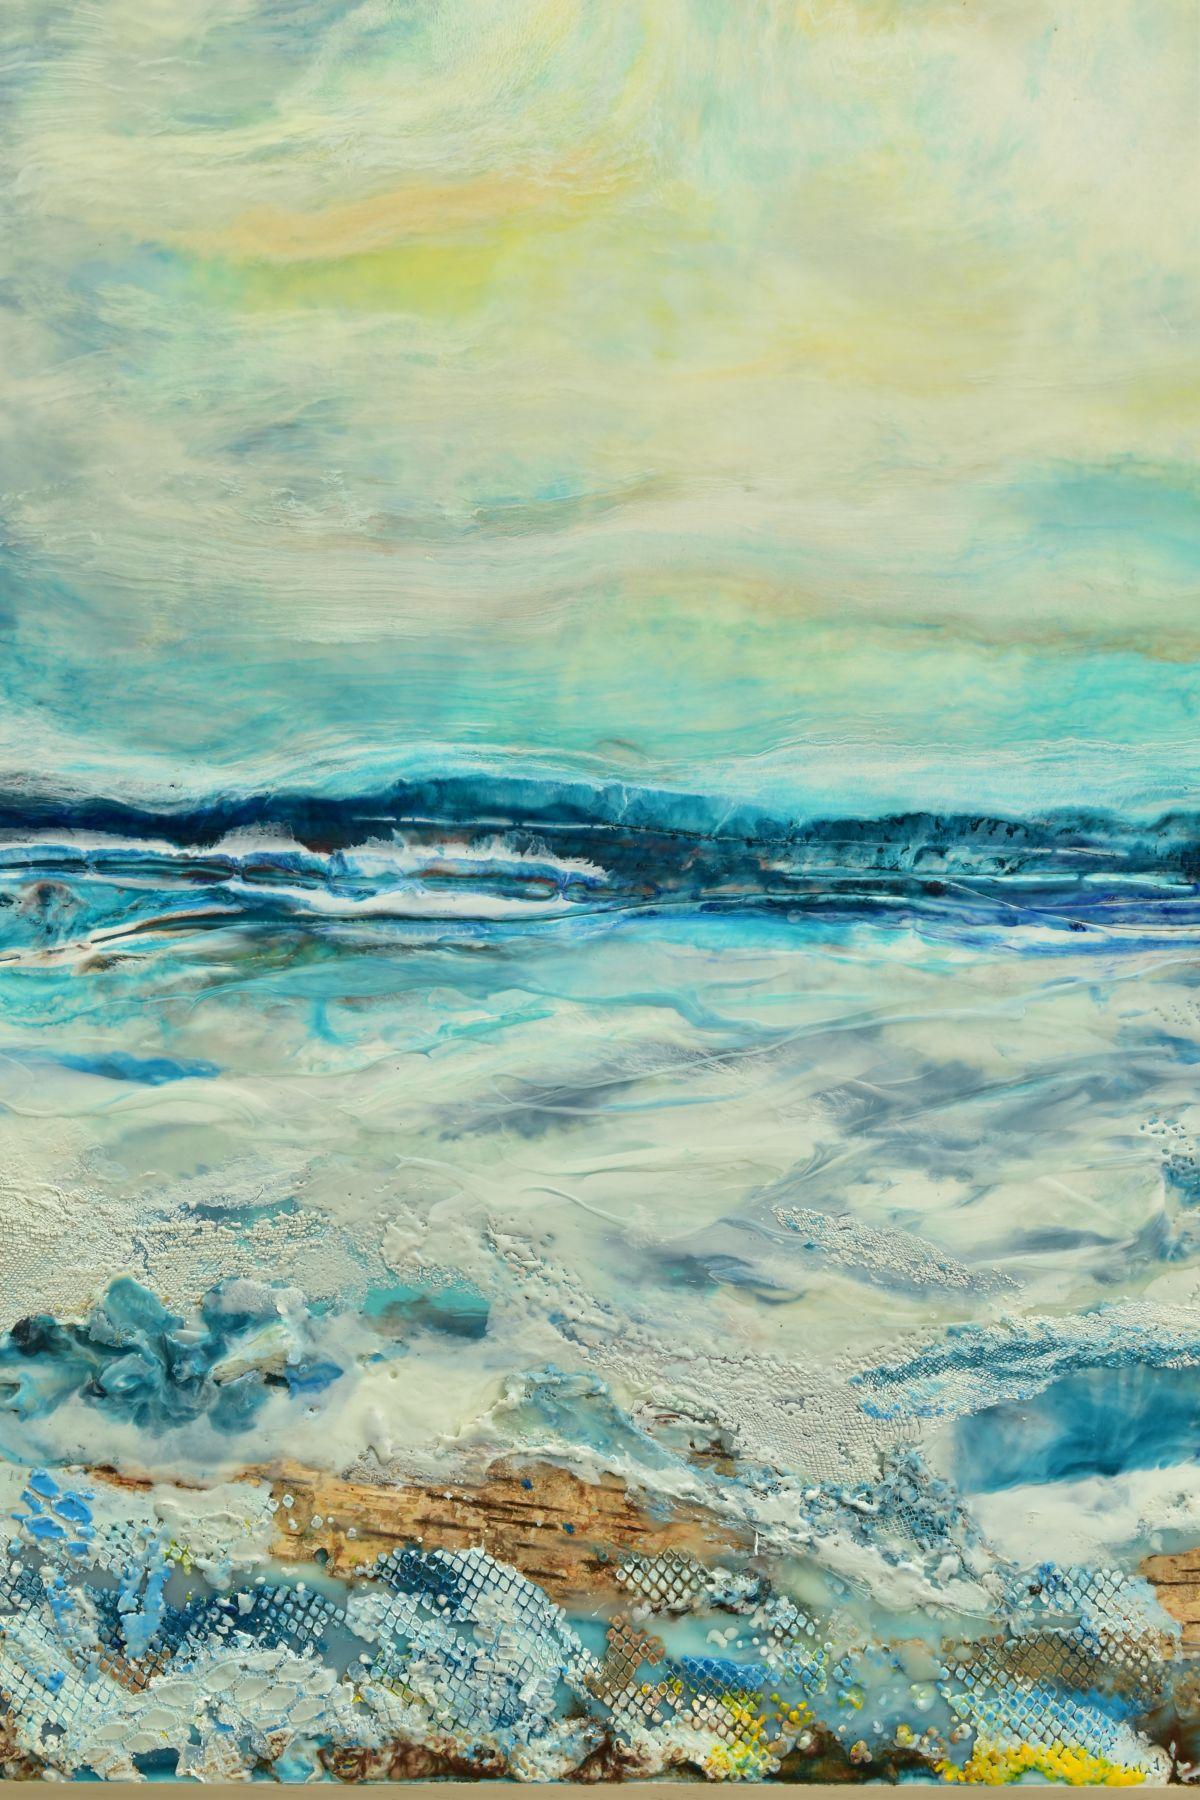 JENNINE PARKER (BRITISH 1971), 'Sea of Splendor', a coastal seascape, initialled bottom right, mixed - Image 2 of 7